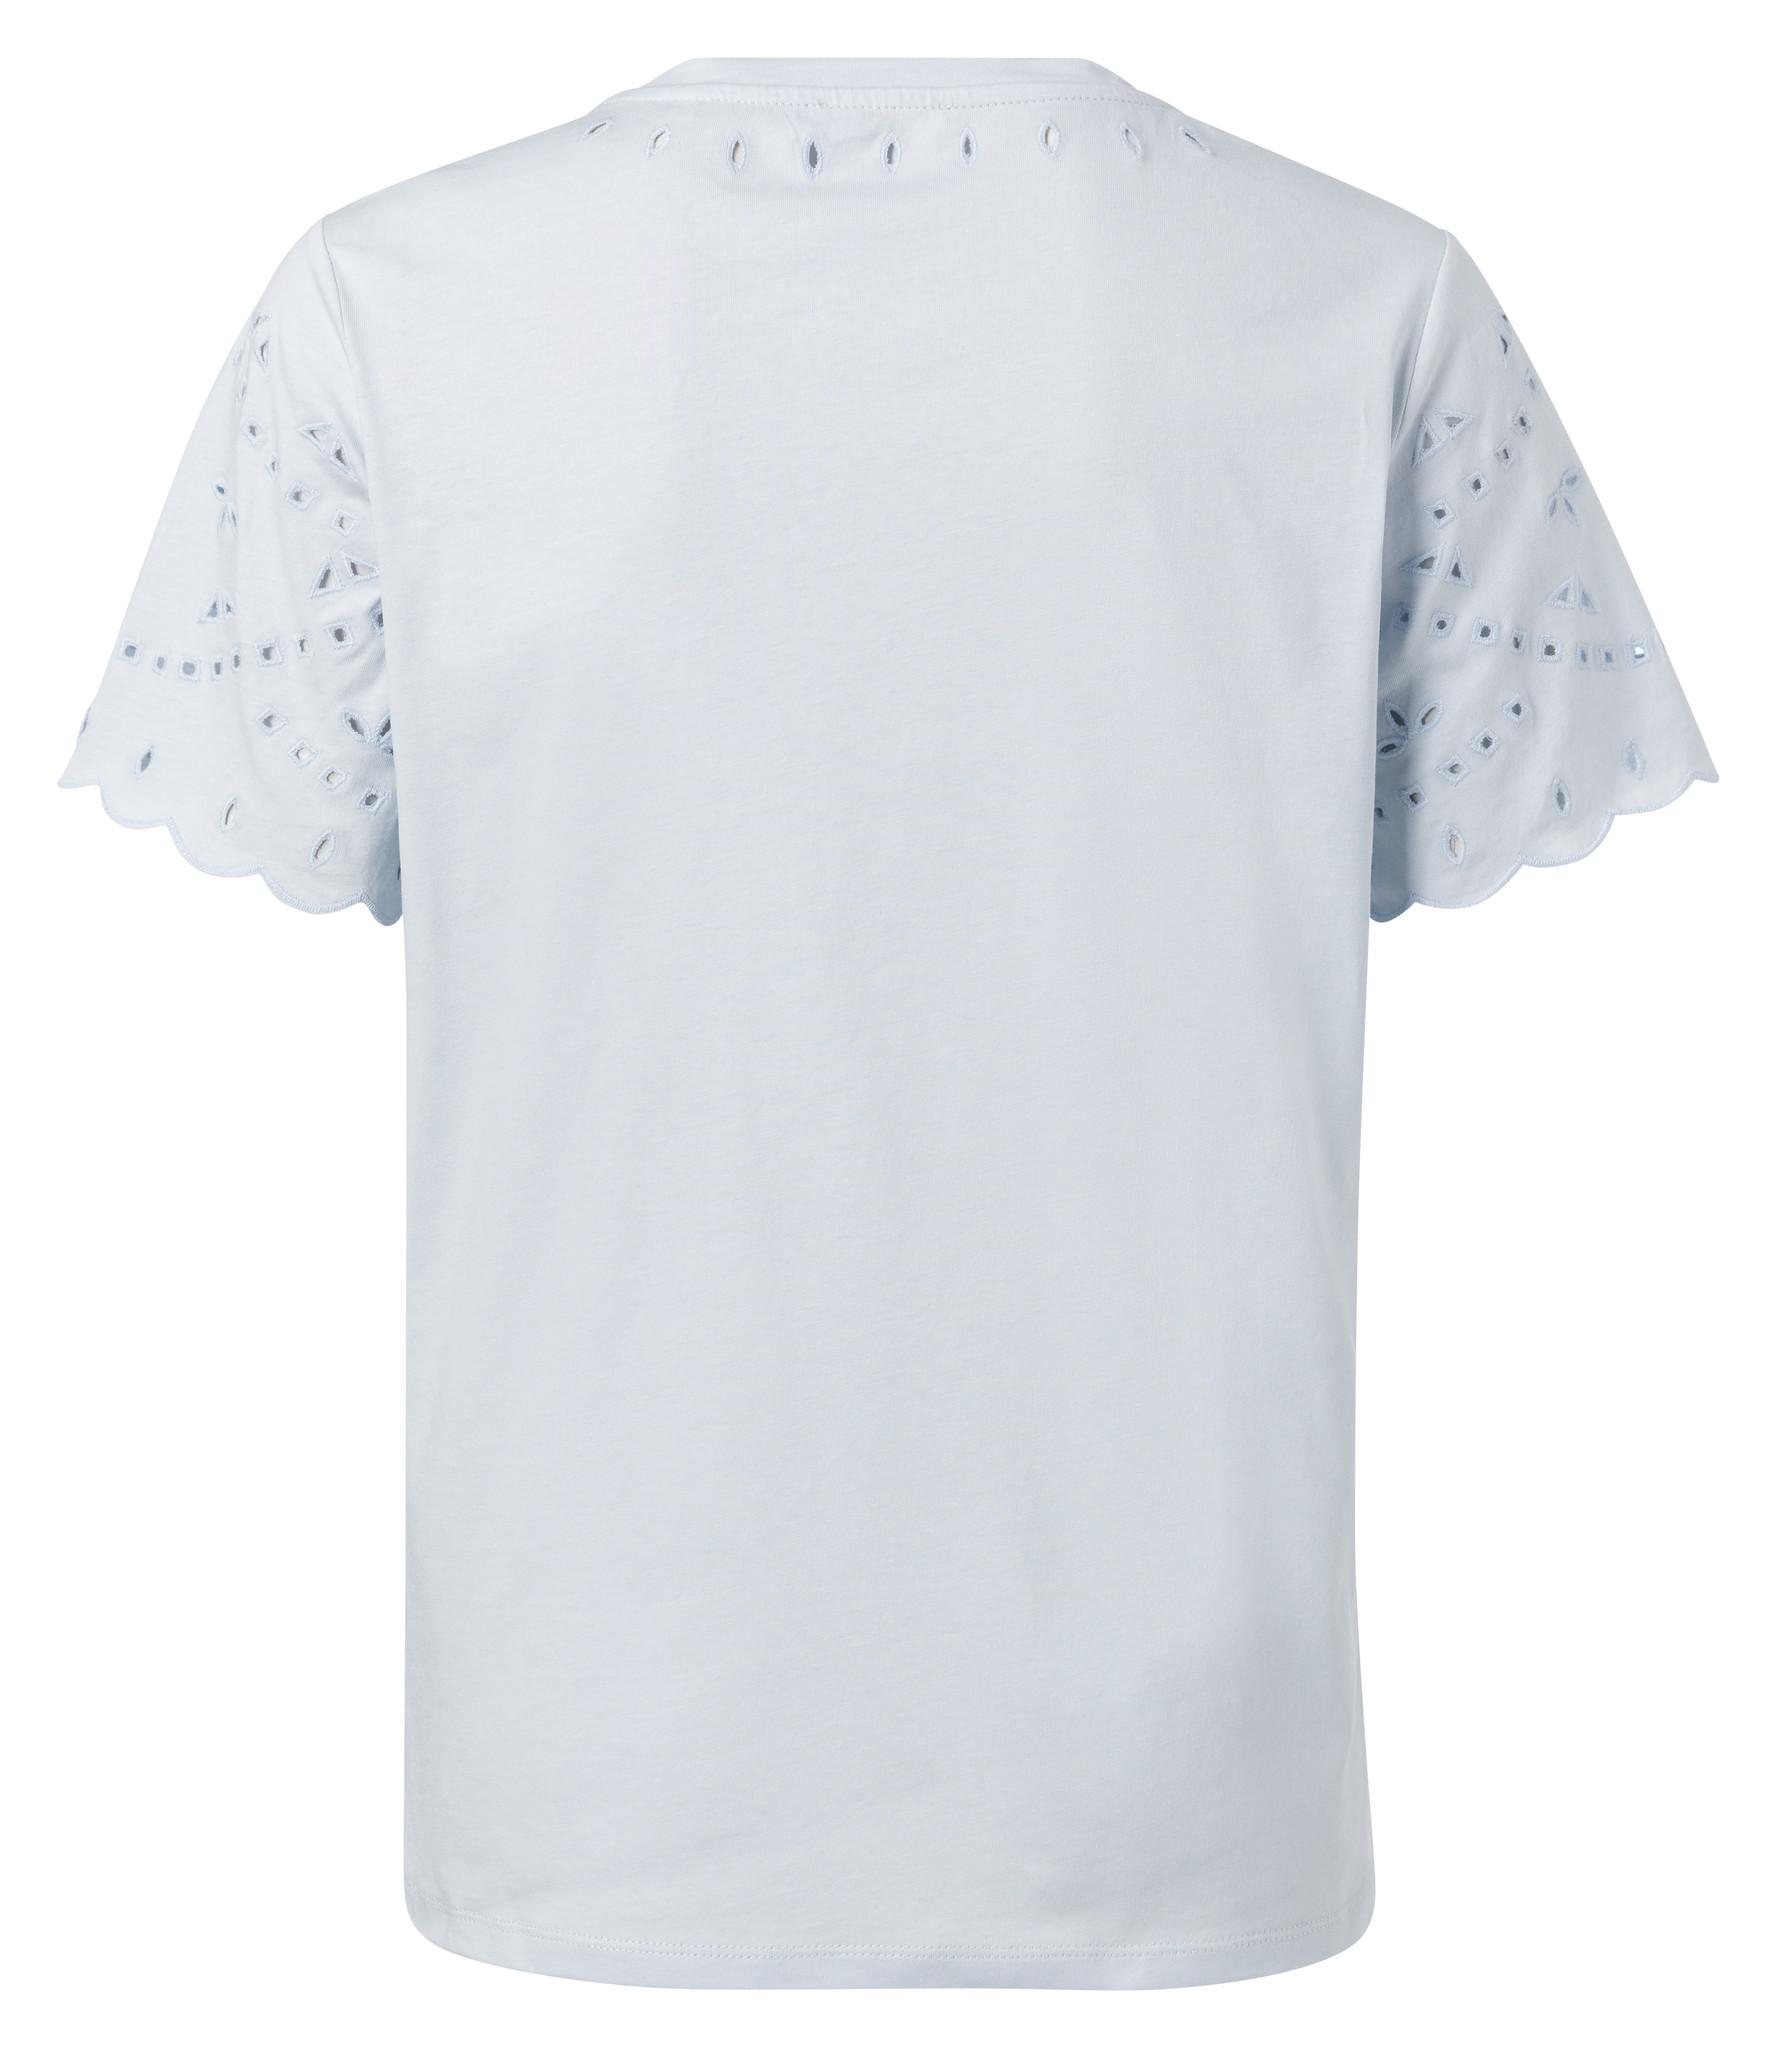 yaya T-shirt with broderi 1919136-014-3